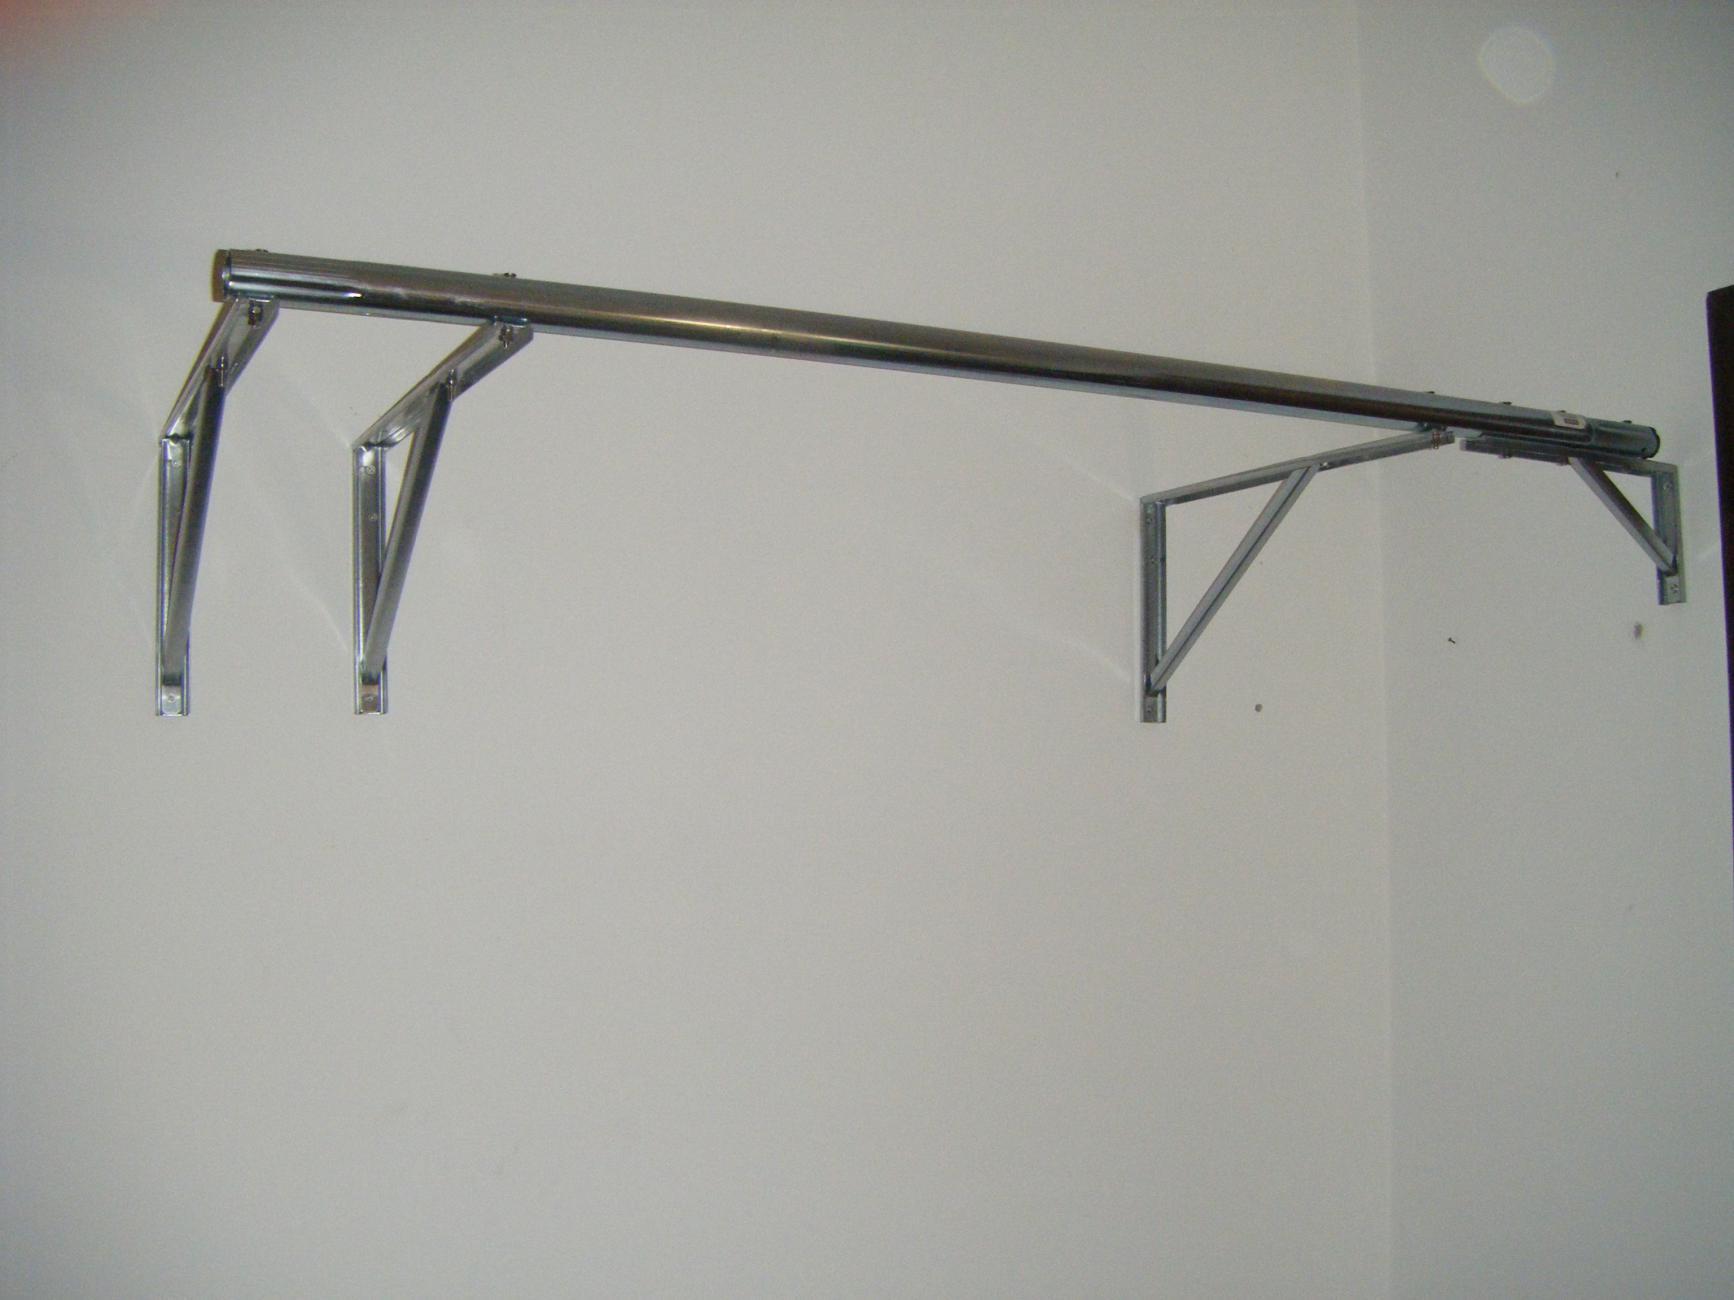 Barra per trazioni fai da te low cost da usare in casa - Ikea appendiabiti da muro ...